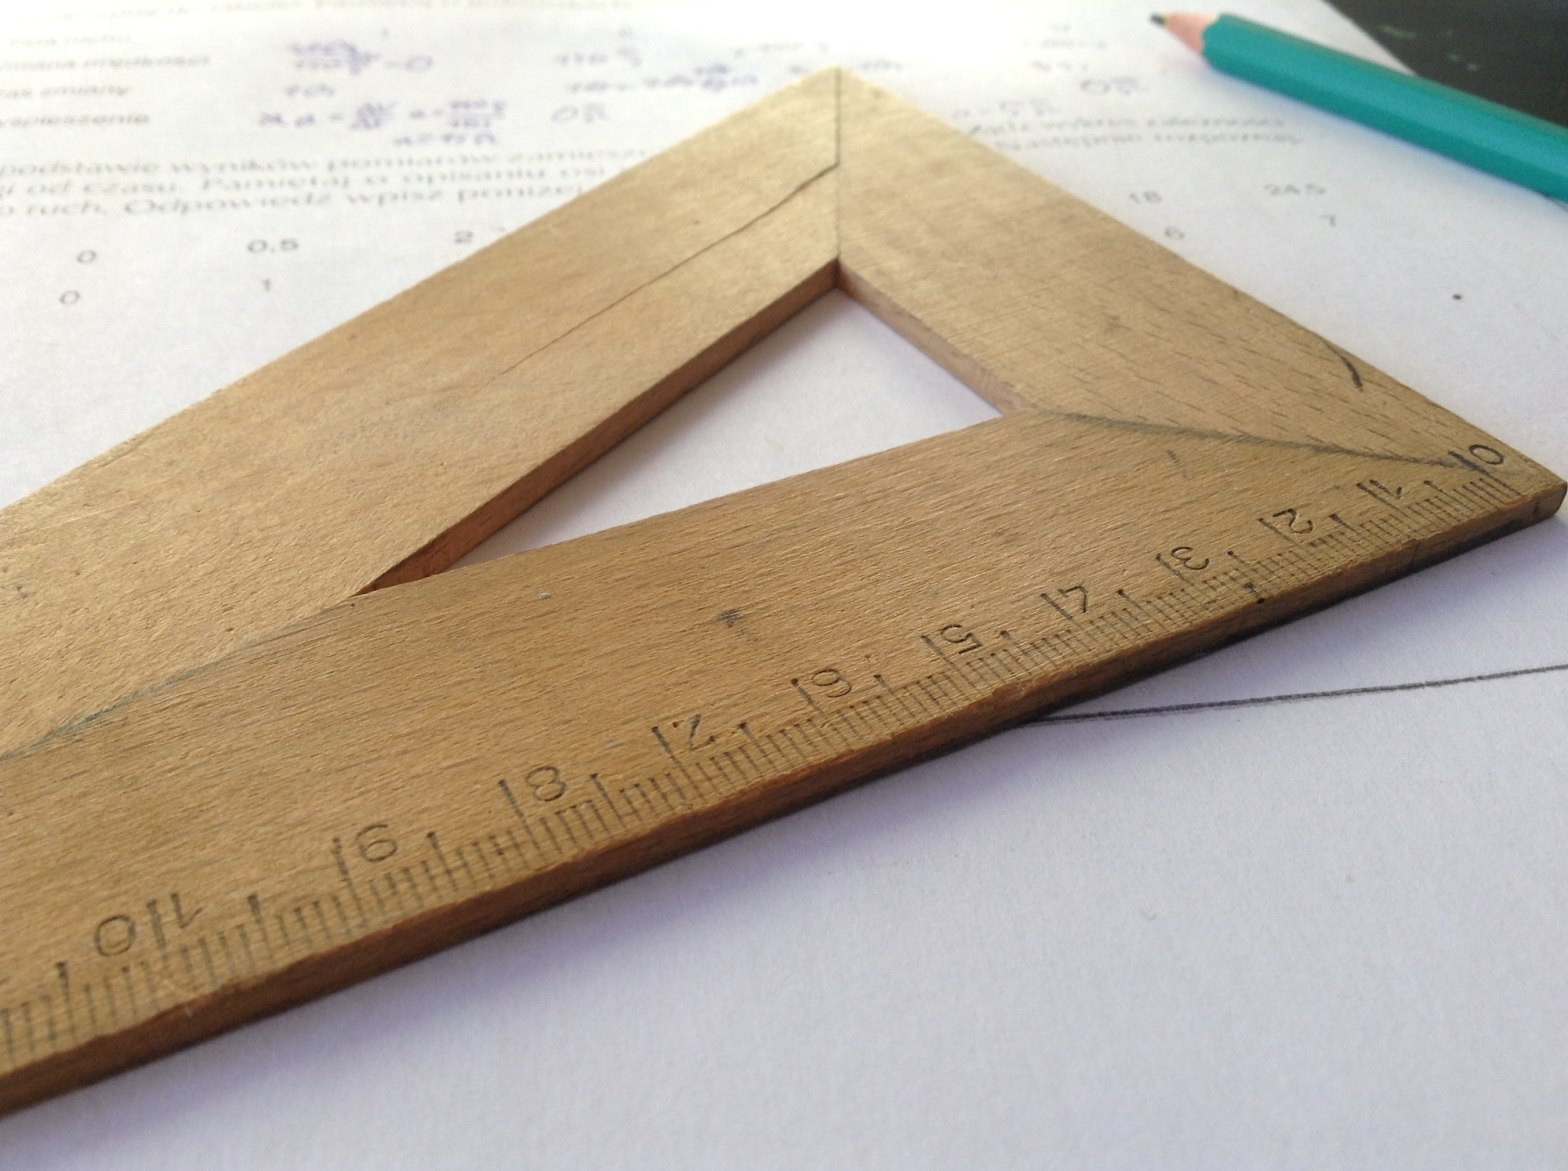 Geometry instruments